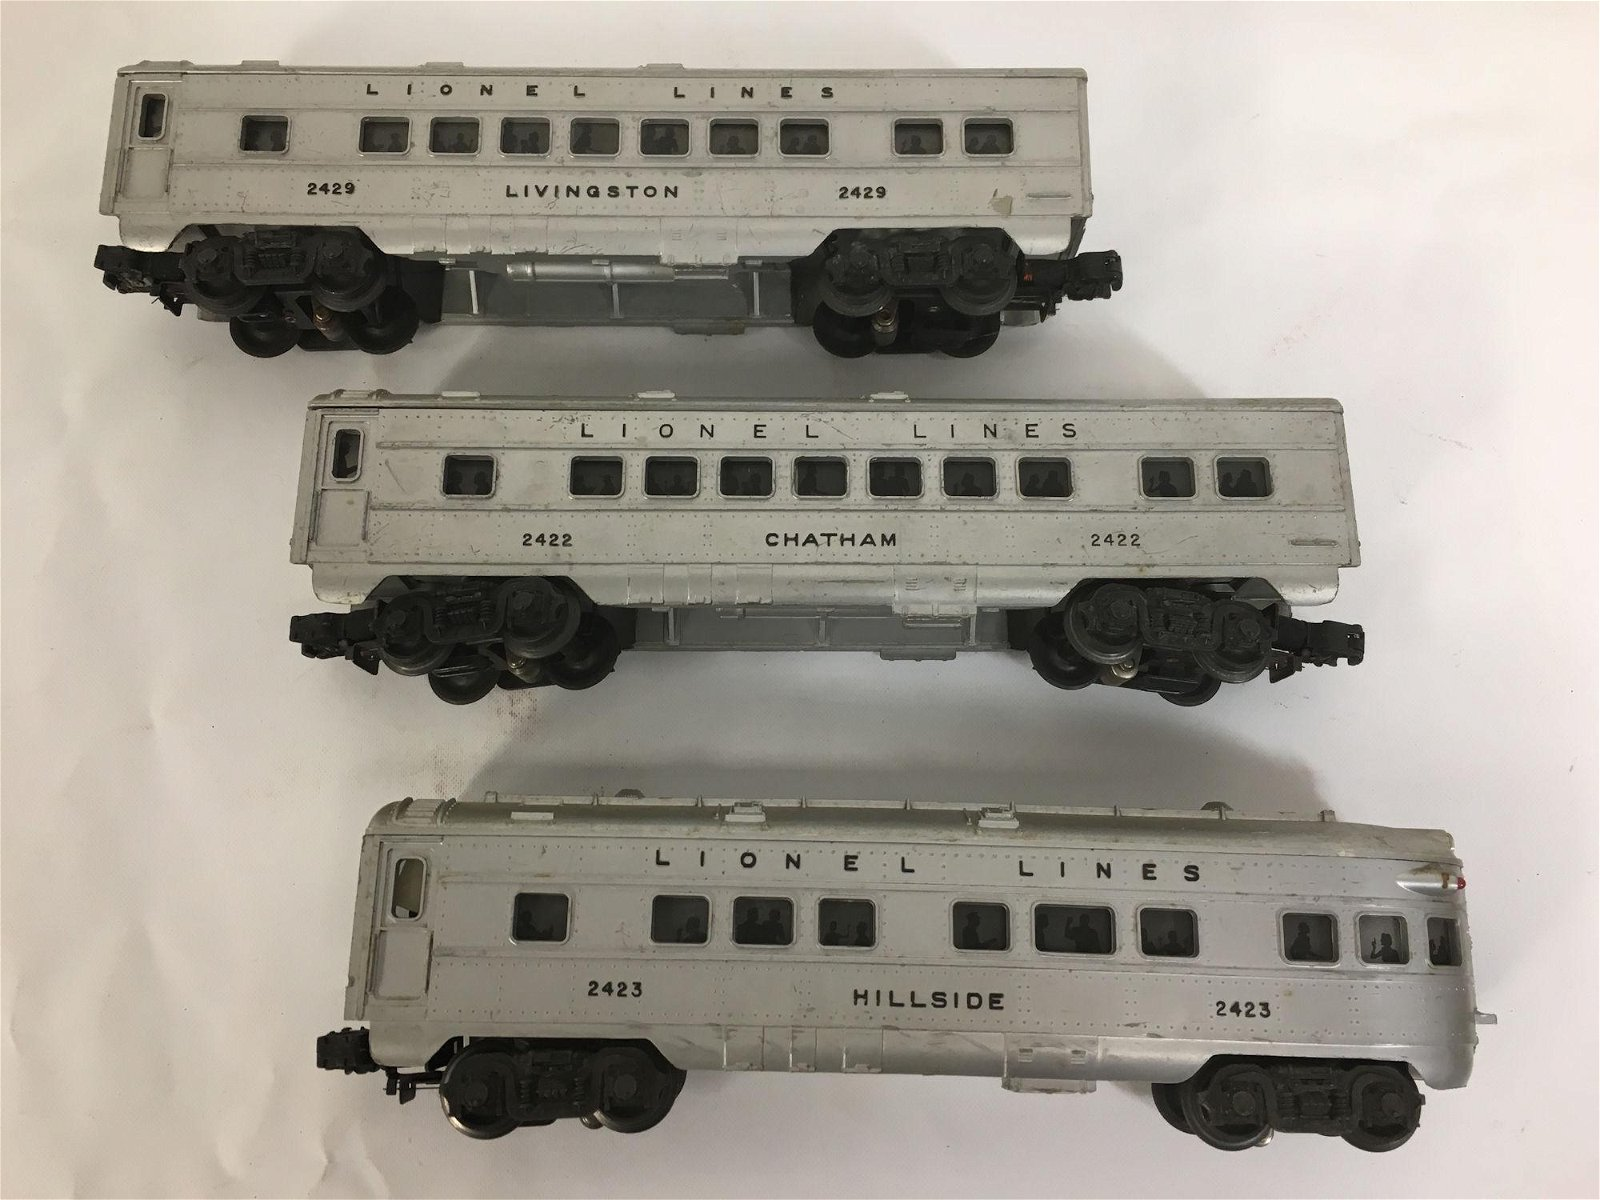 3 LIONEL POSTWAR O GAUGE TRAIN CARS: NO. 2422, 2423.